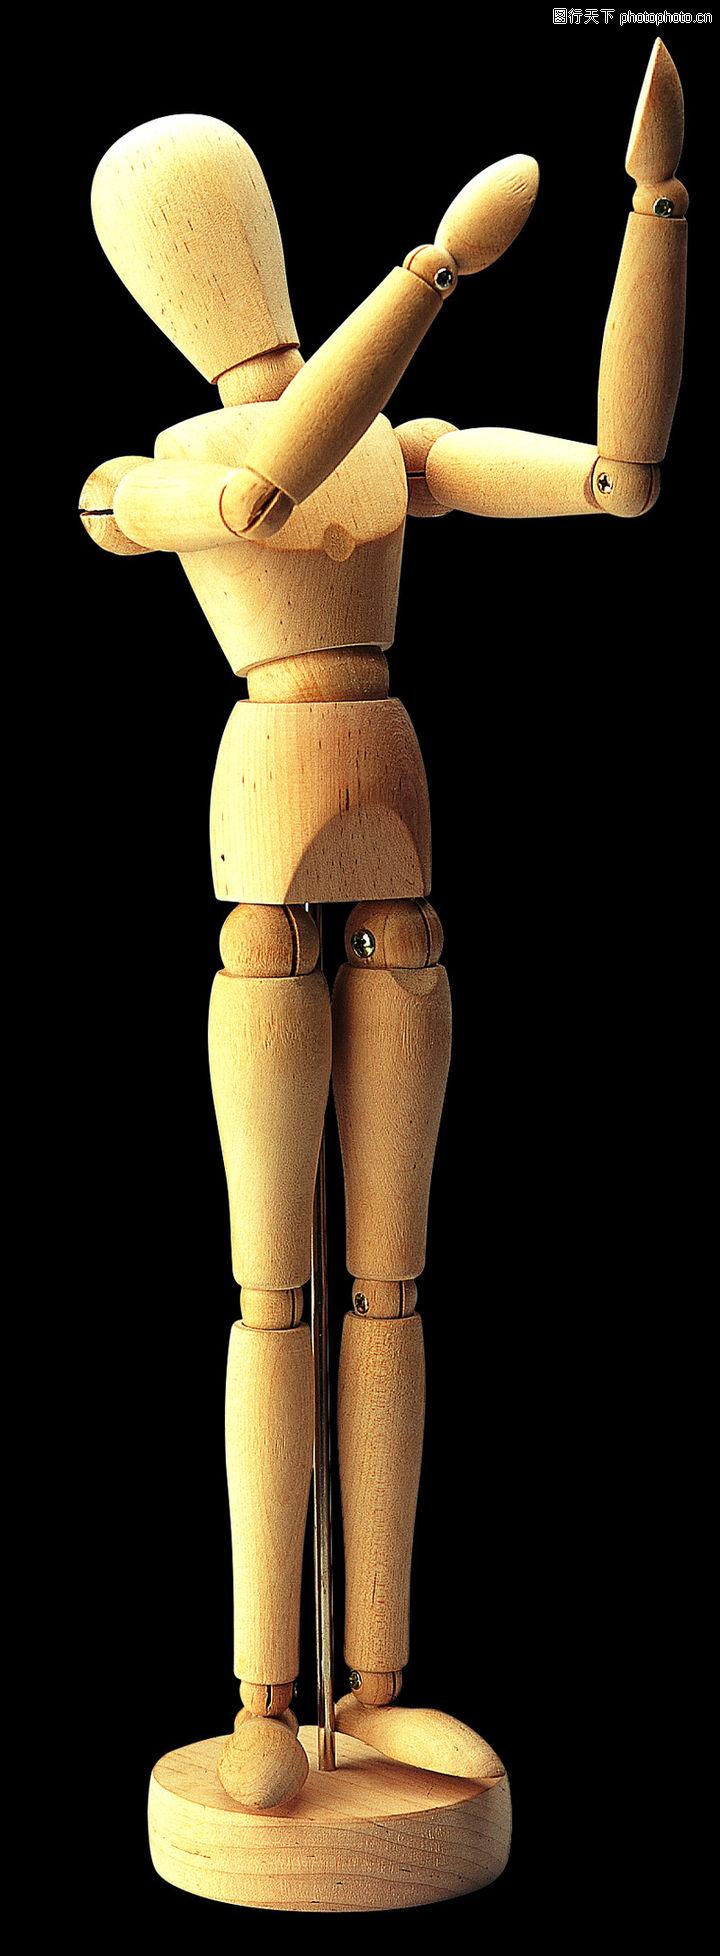 木头人,静物,木头人0040